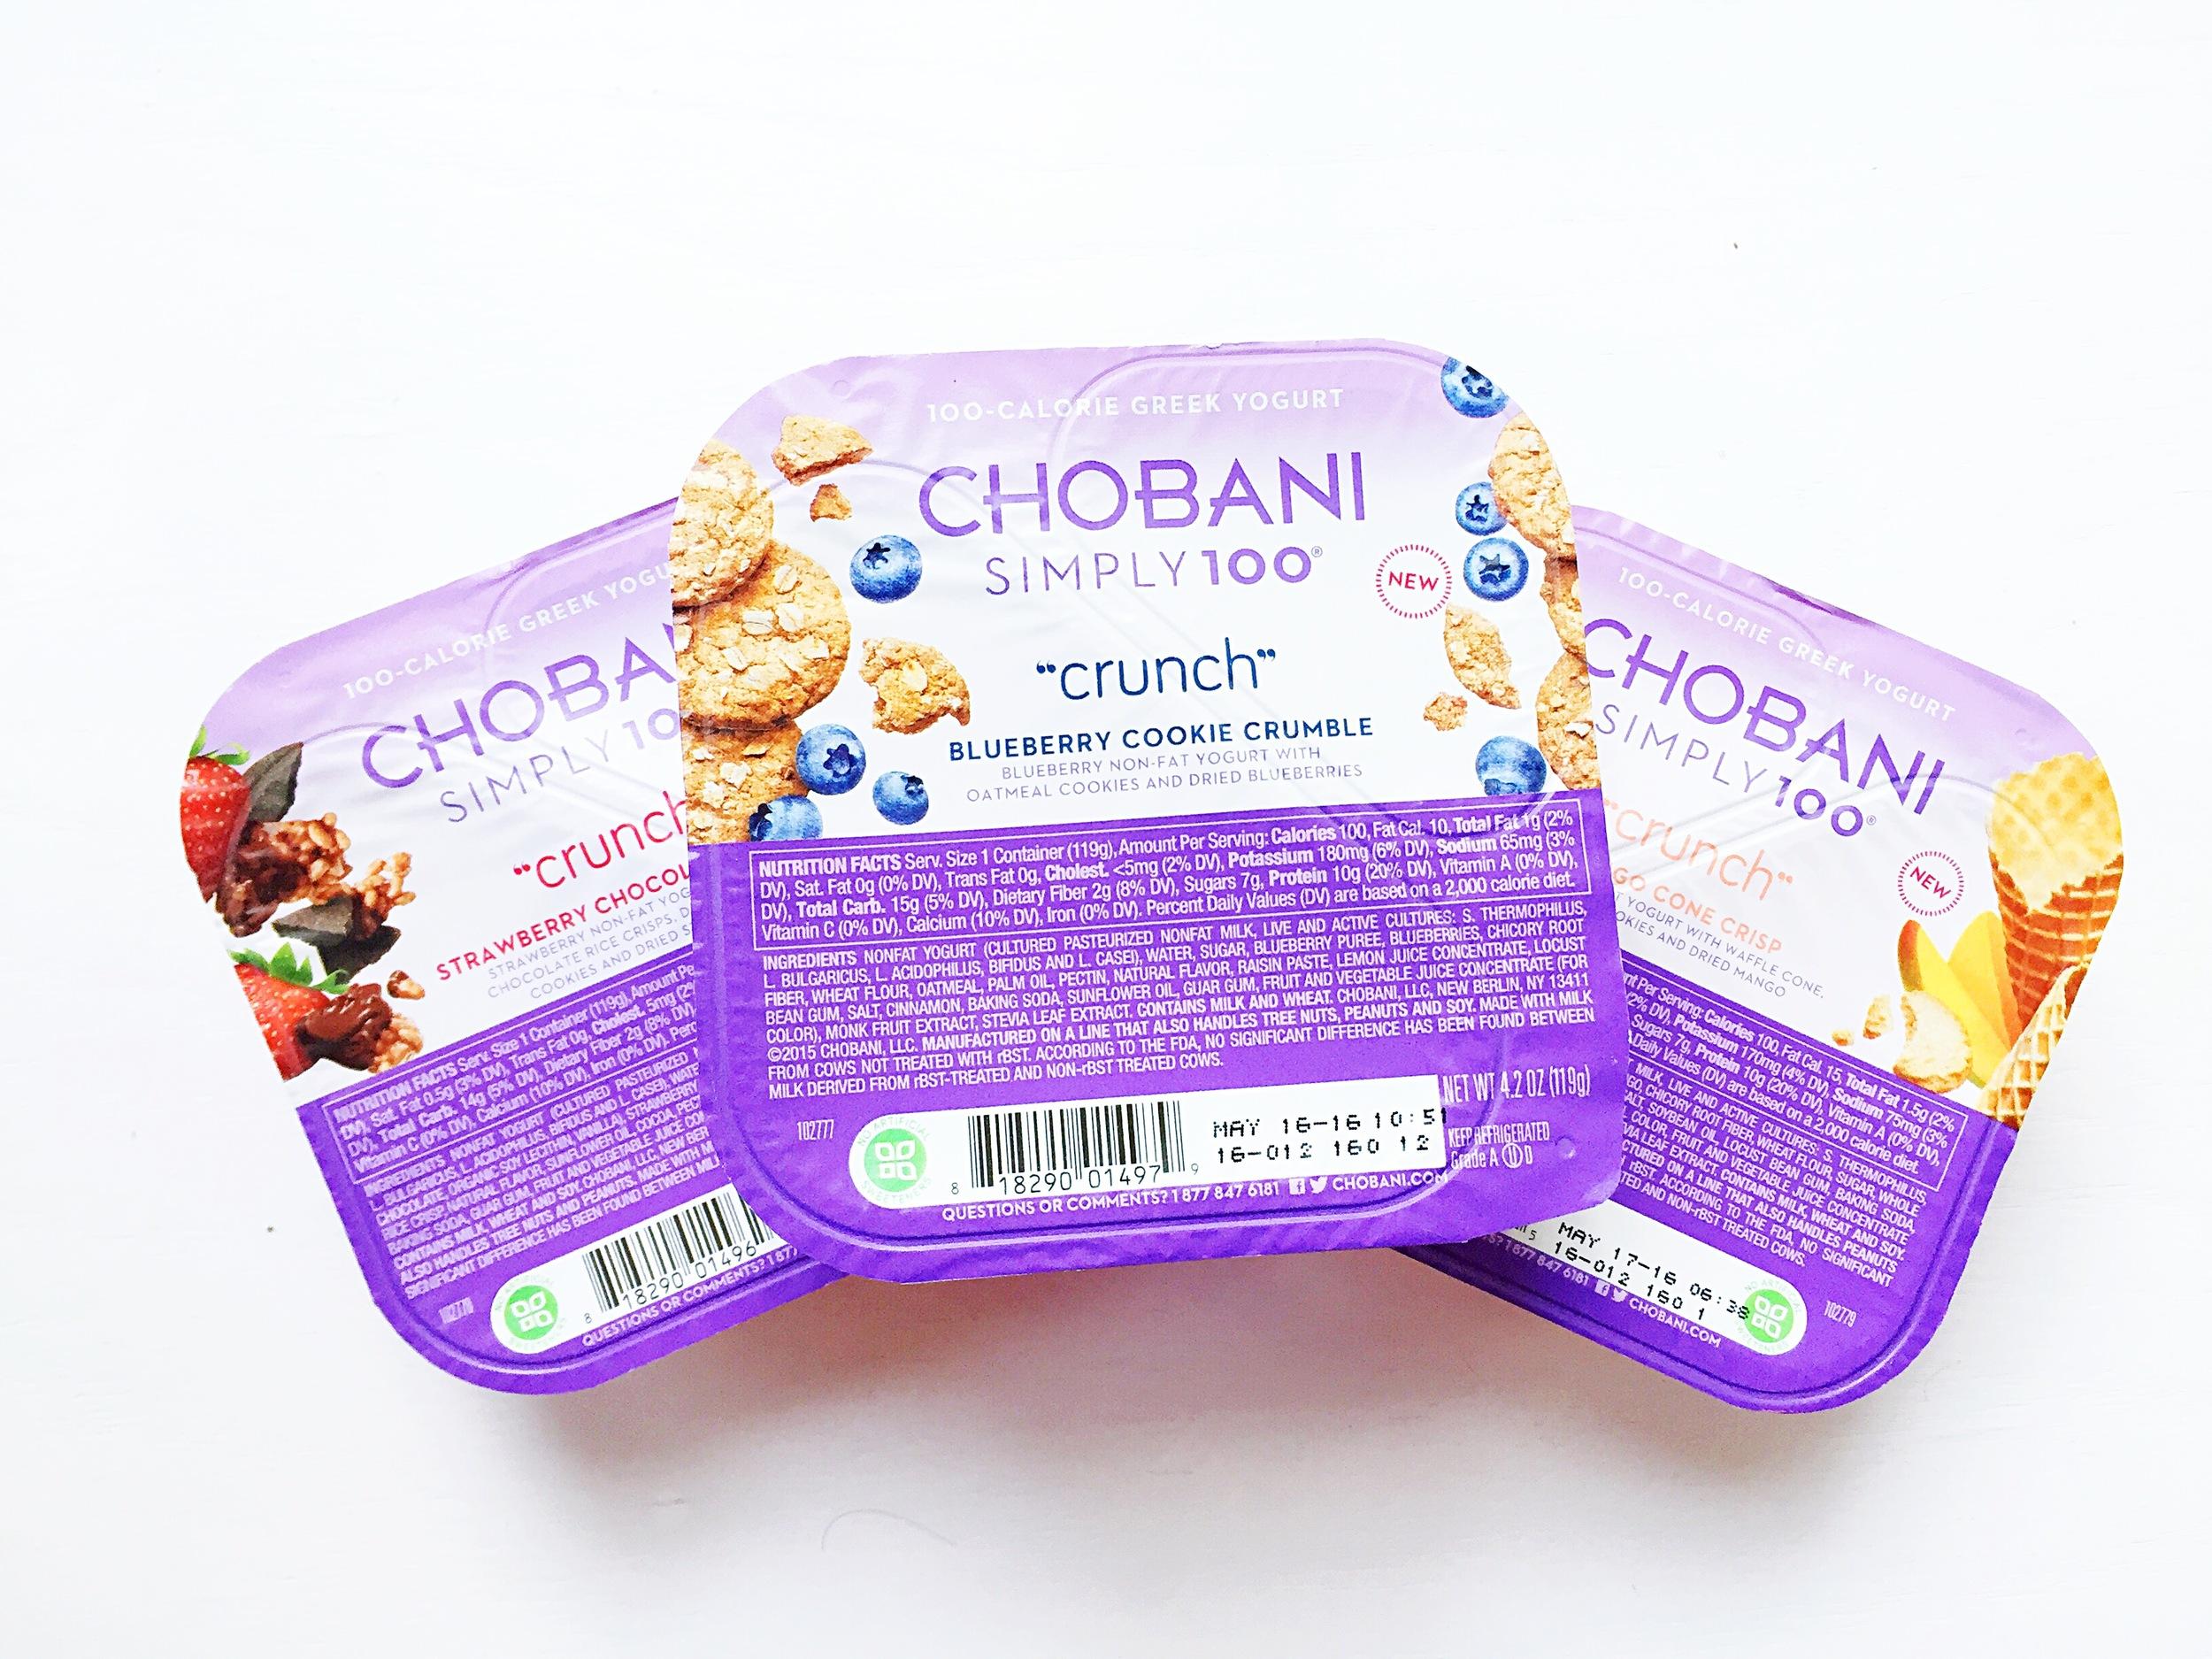 chobani-simply-100-crunch